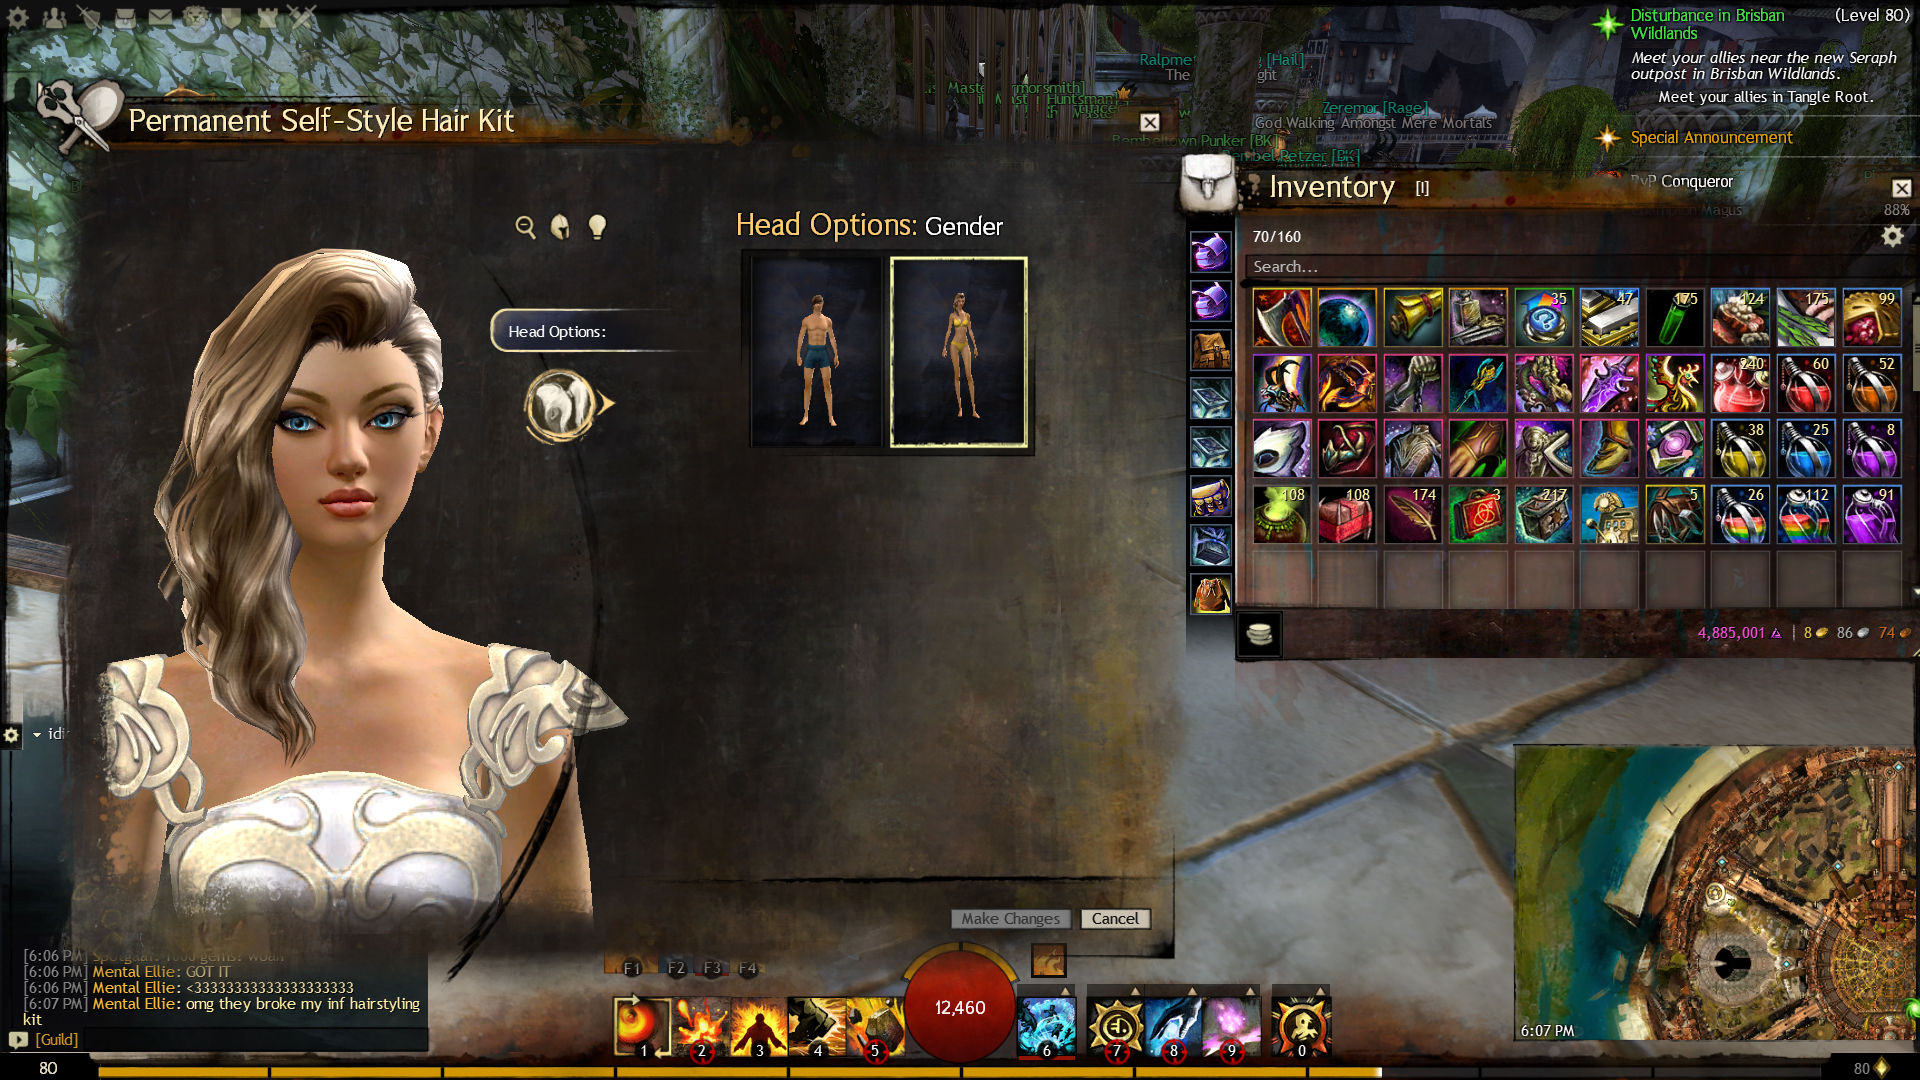 guild wars 2 forum - bugs: game, forum, website - permanent self